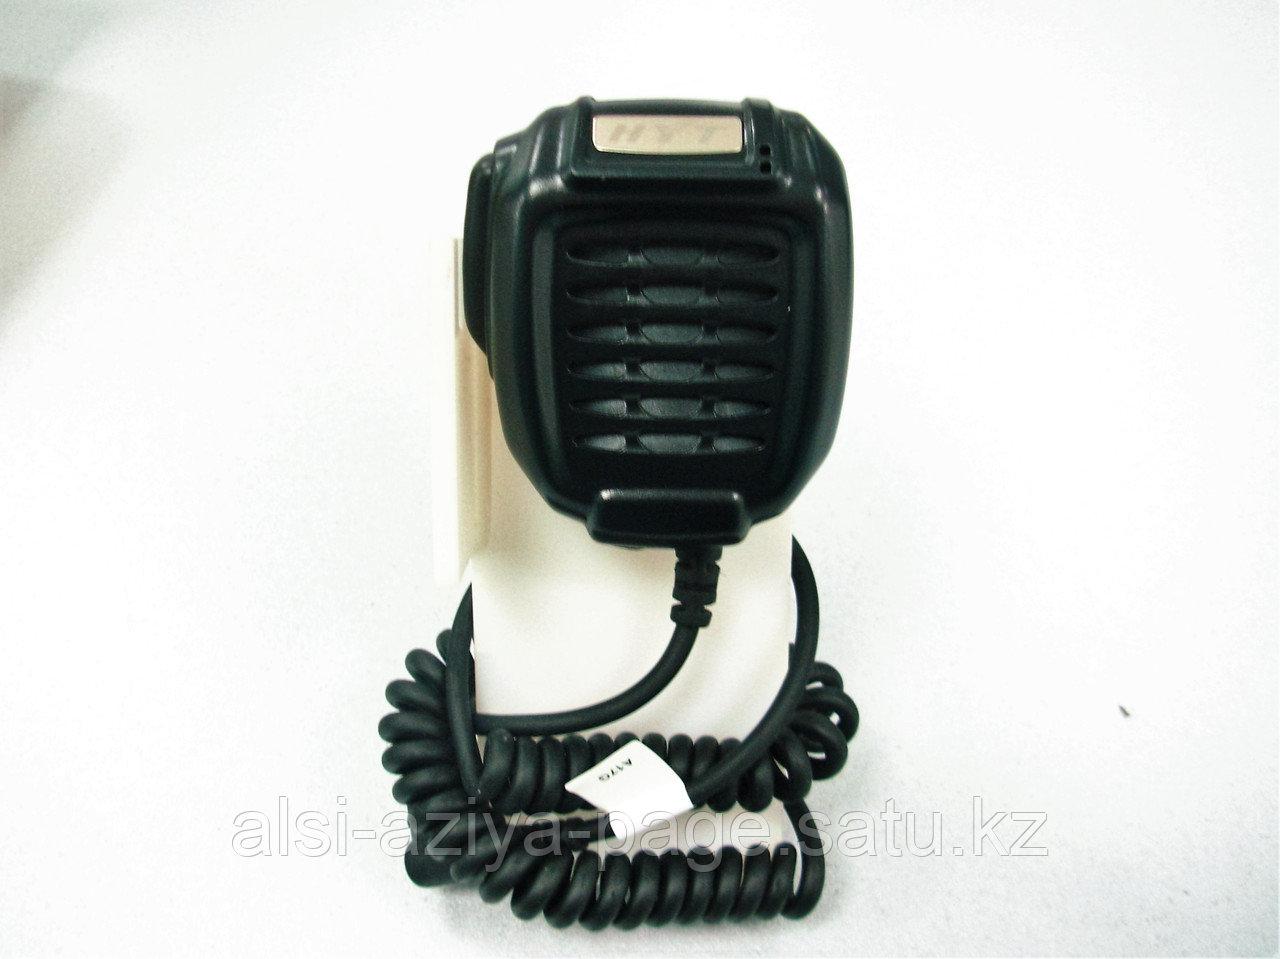 Микрофон для TC-700EX Plus